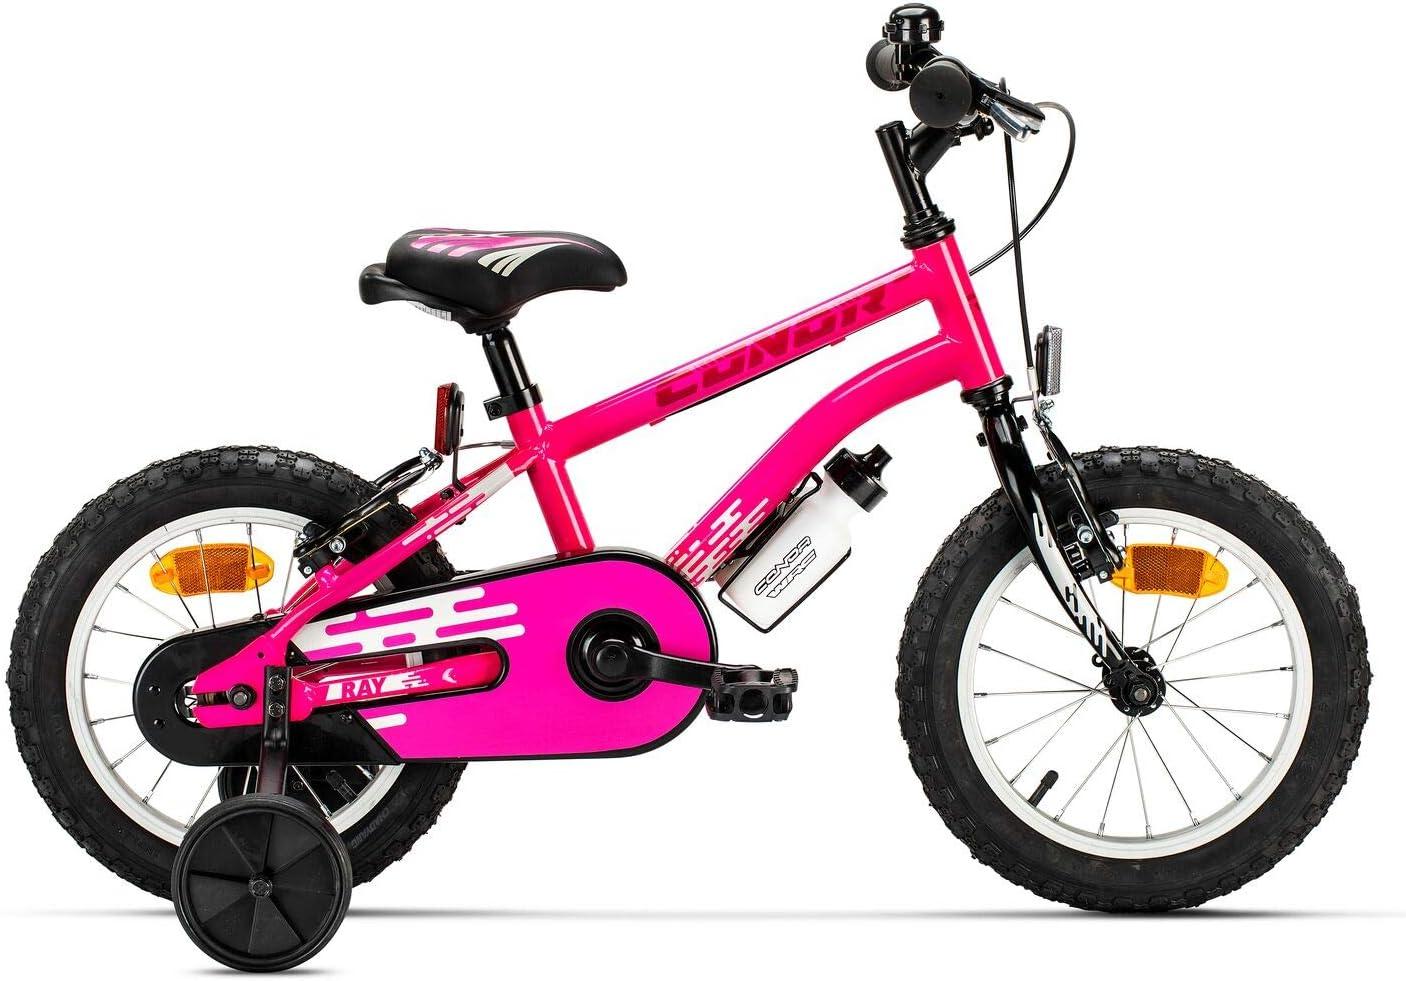 Conor Bicicleta Ray Rosa. Bicicleta Infantil de Cuatro Ruedas ...